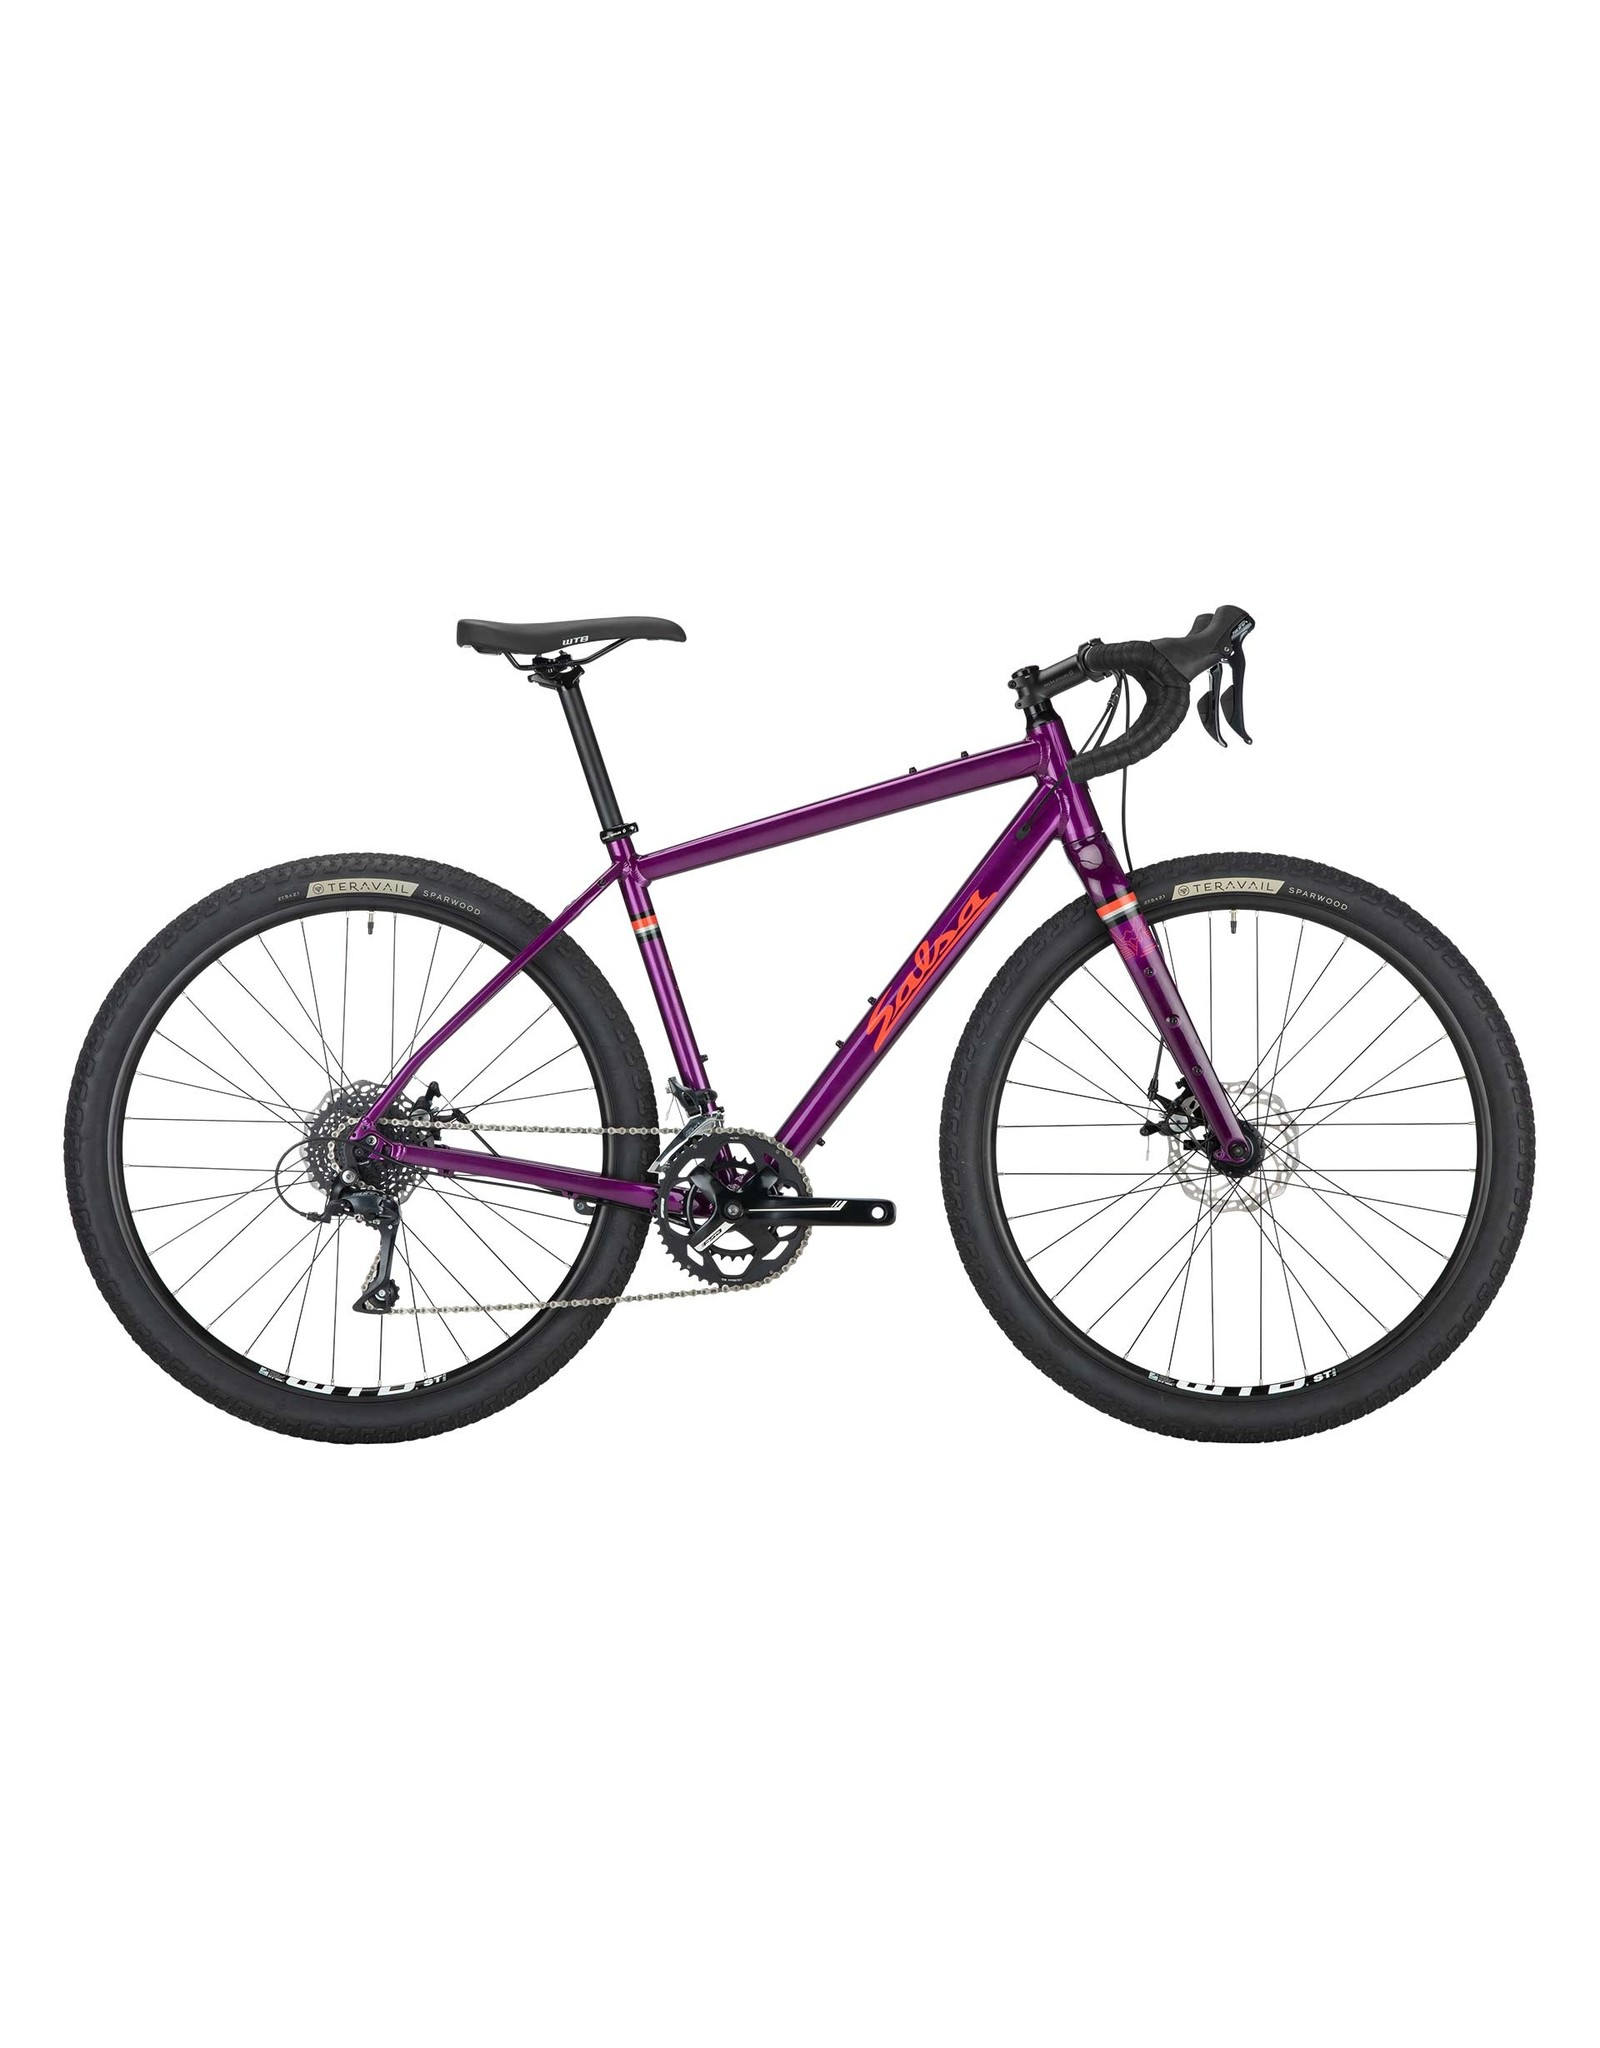 Salsa Salsa Journeyman Sora 650 Bike - 650b, Aluminum, Purple, 55.5cm